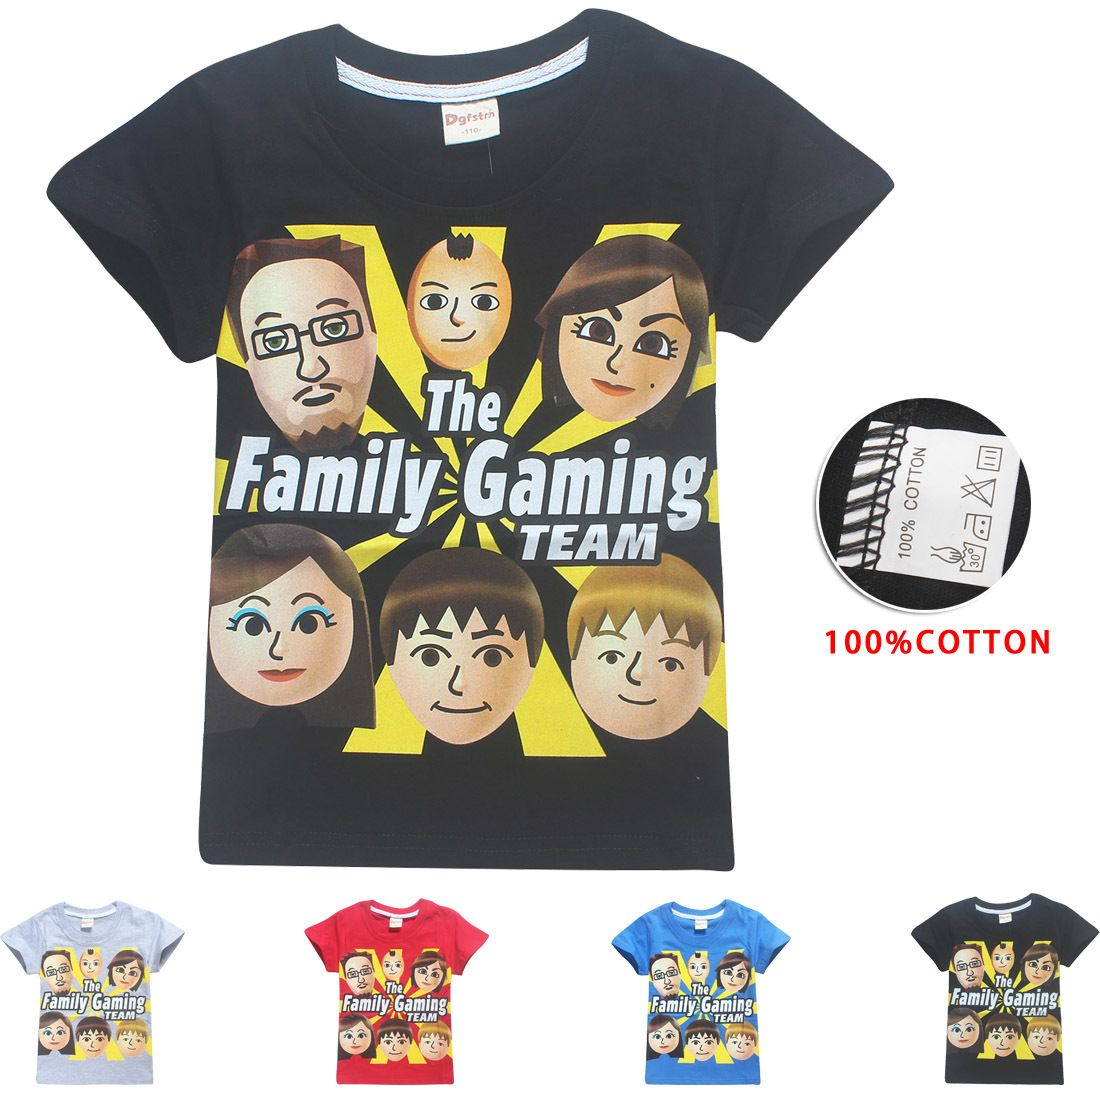 I/'M A GURKEY TURKEY  WHITE T-SHIRT CHILD ADULT TOP TEE FUNNEL VISION FGTV GAMES